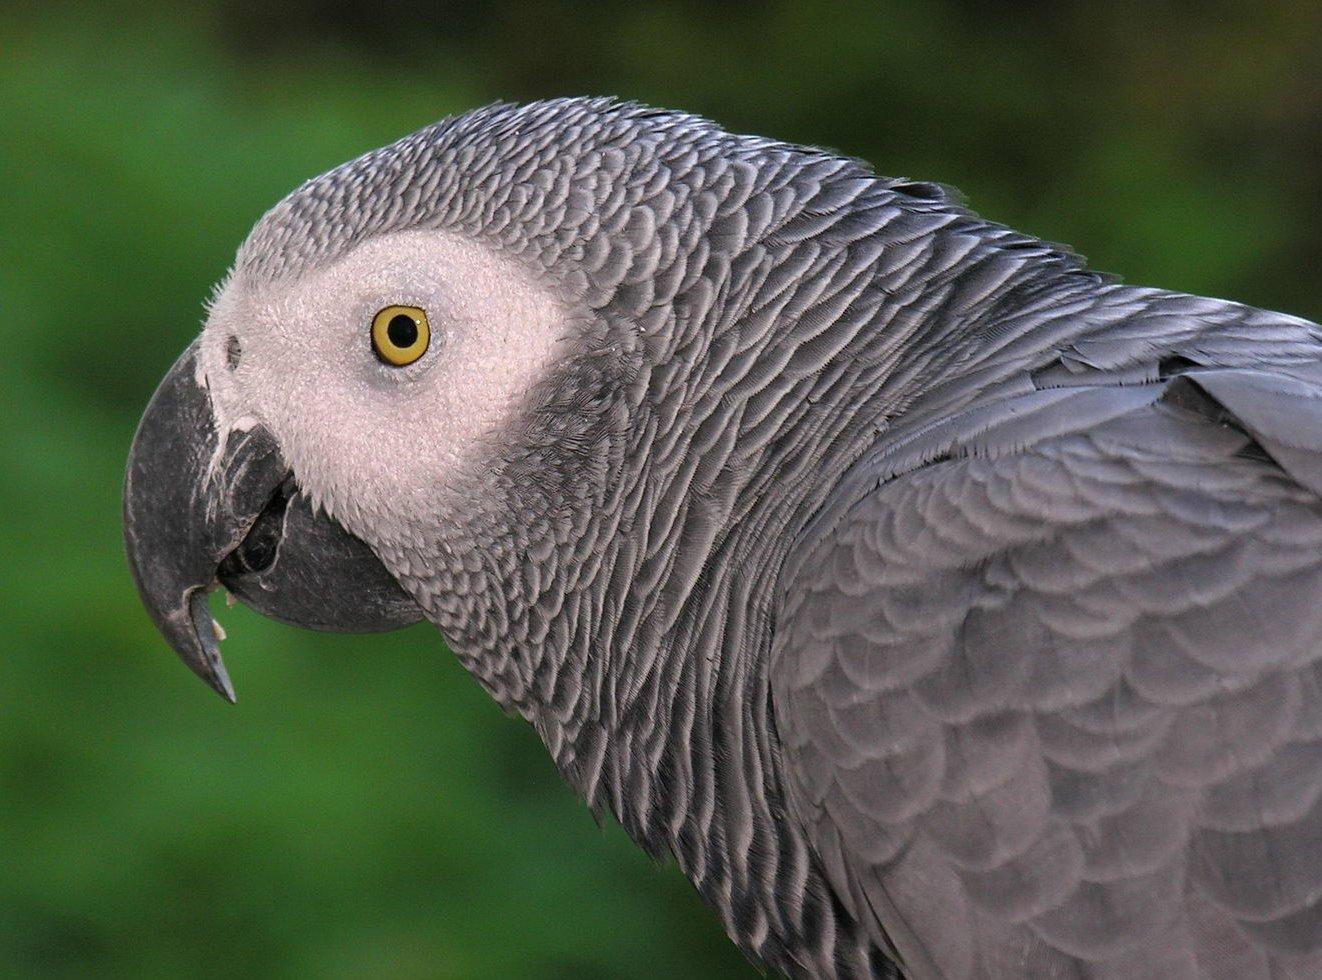 Bird Snatching Bandits Kidnap African Grey Parrot to Near Extinction in Ghana